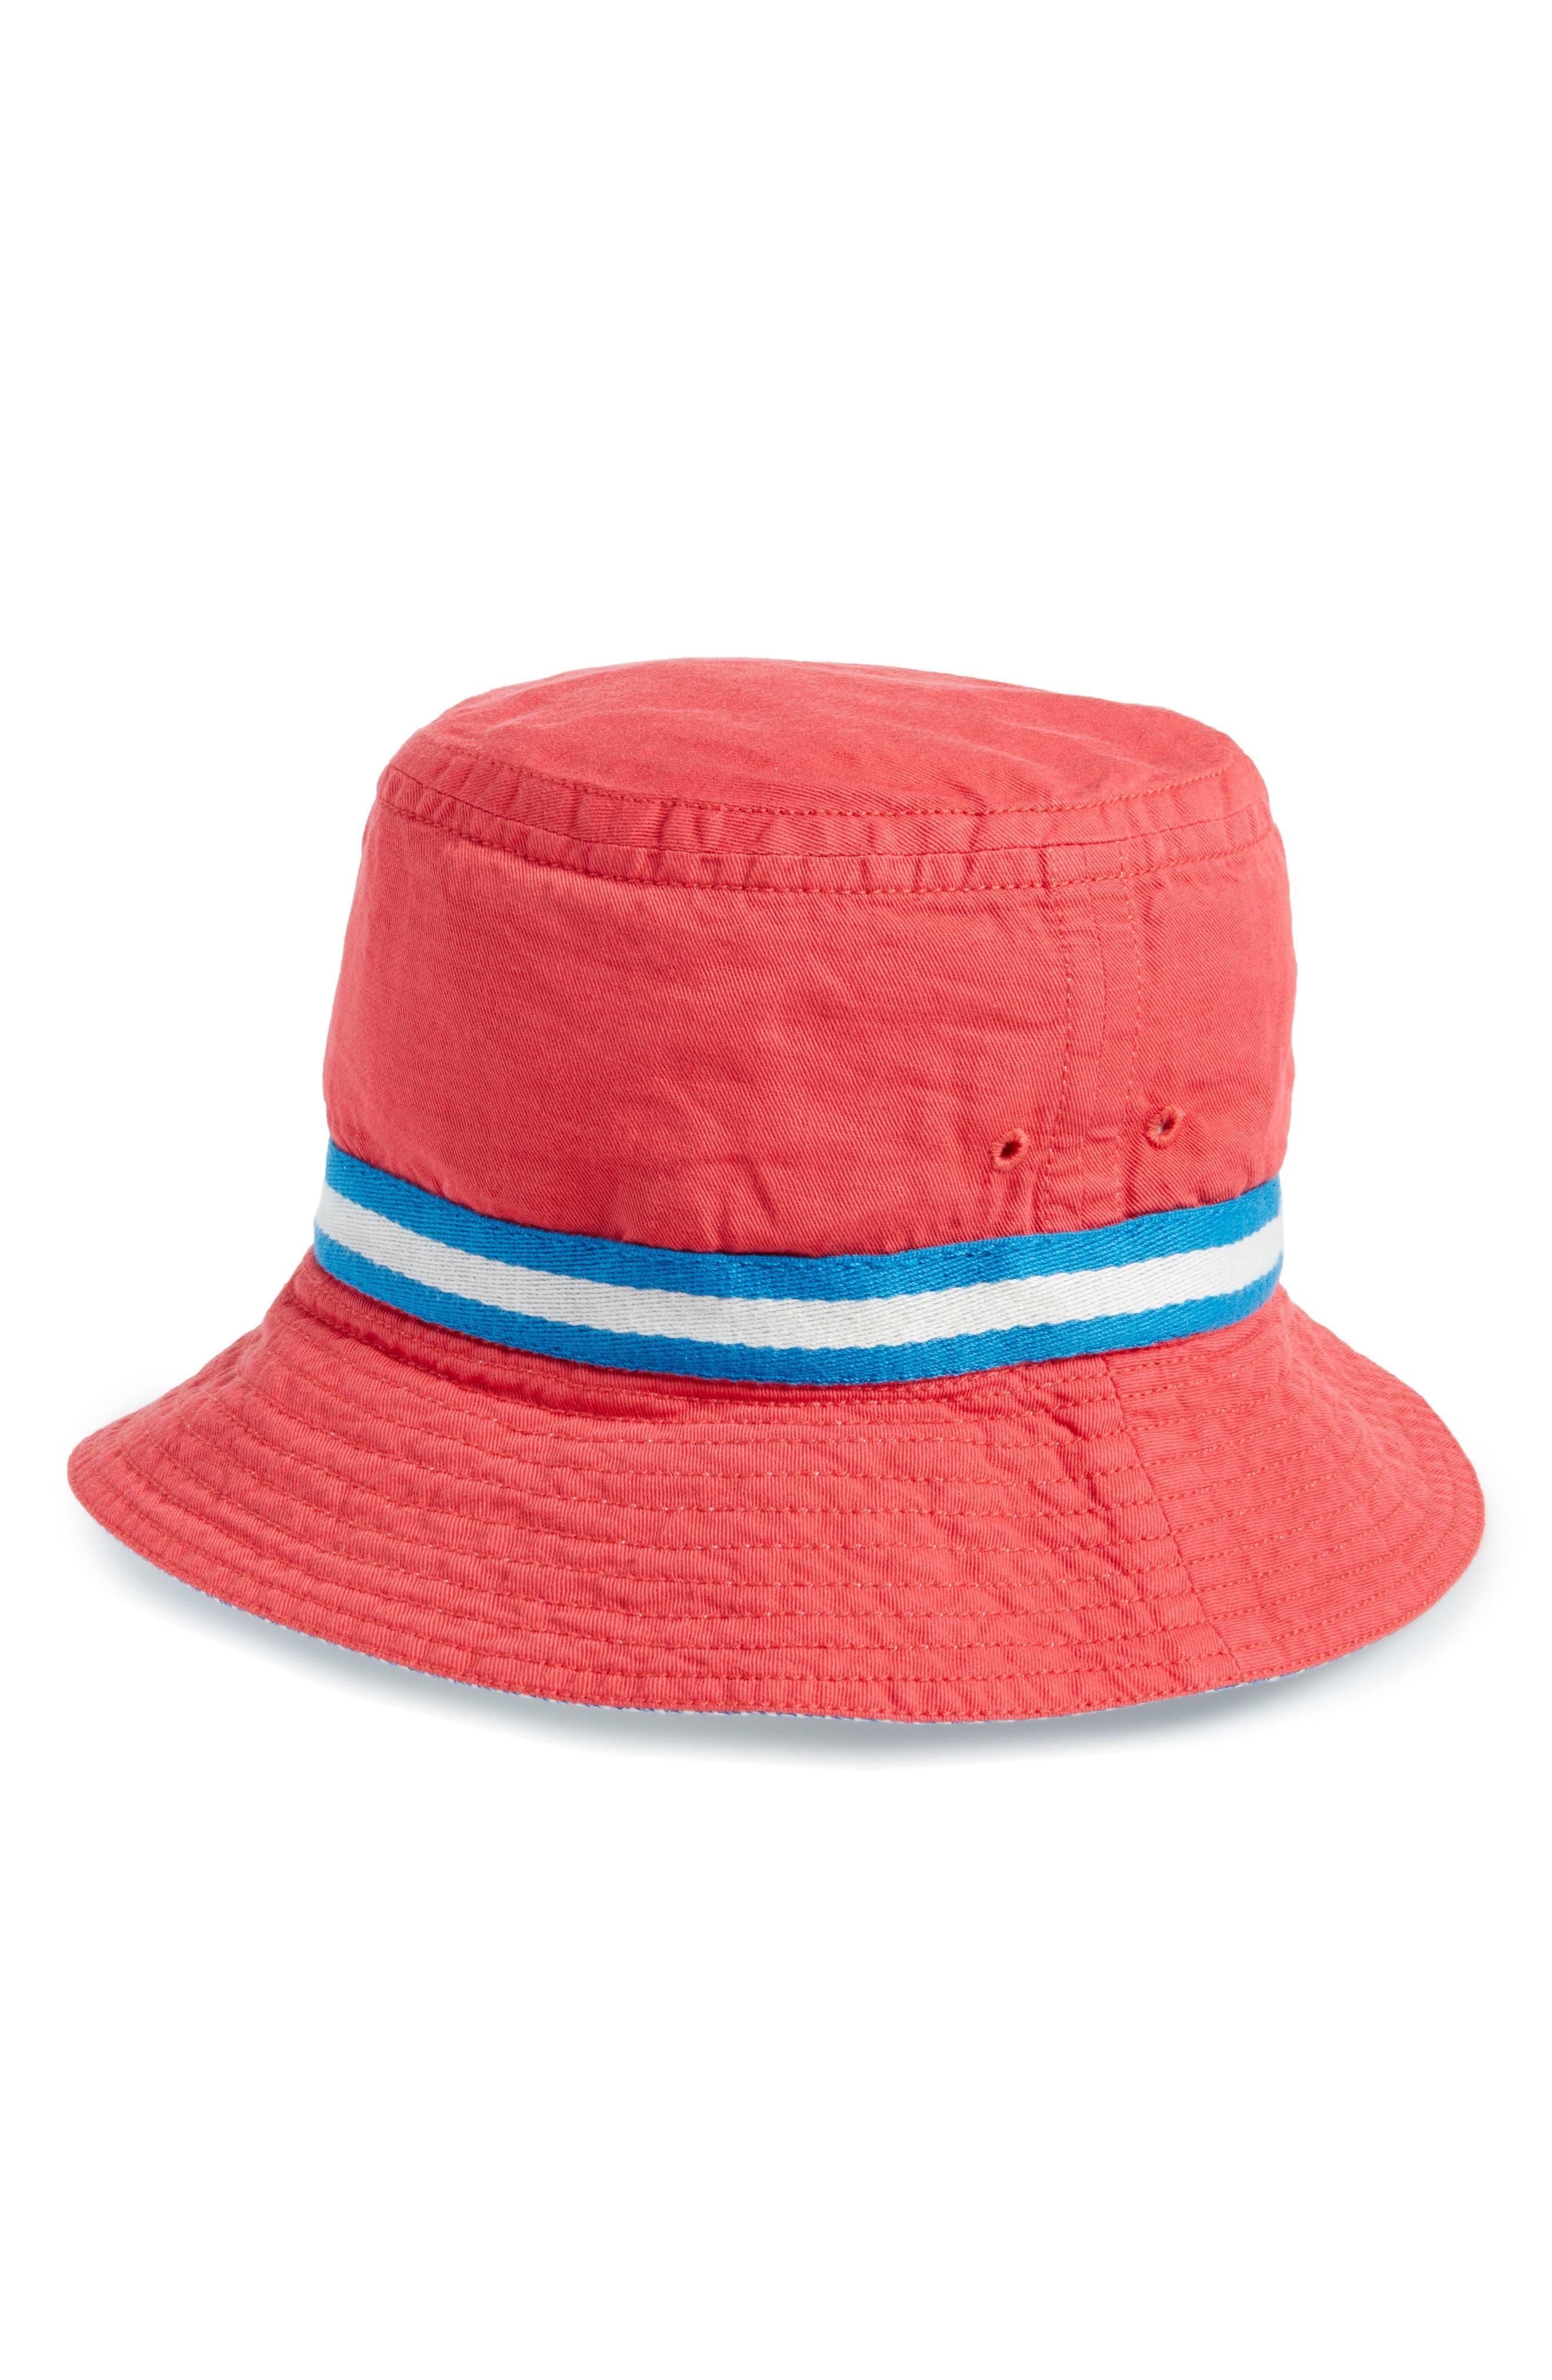 Fisherman's Hat,                             Main thumbnail 1, color,                             614